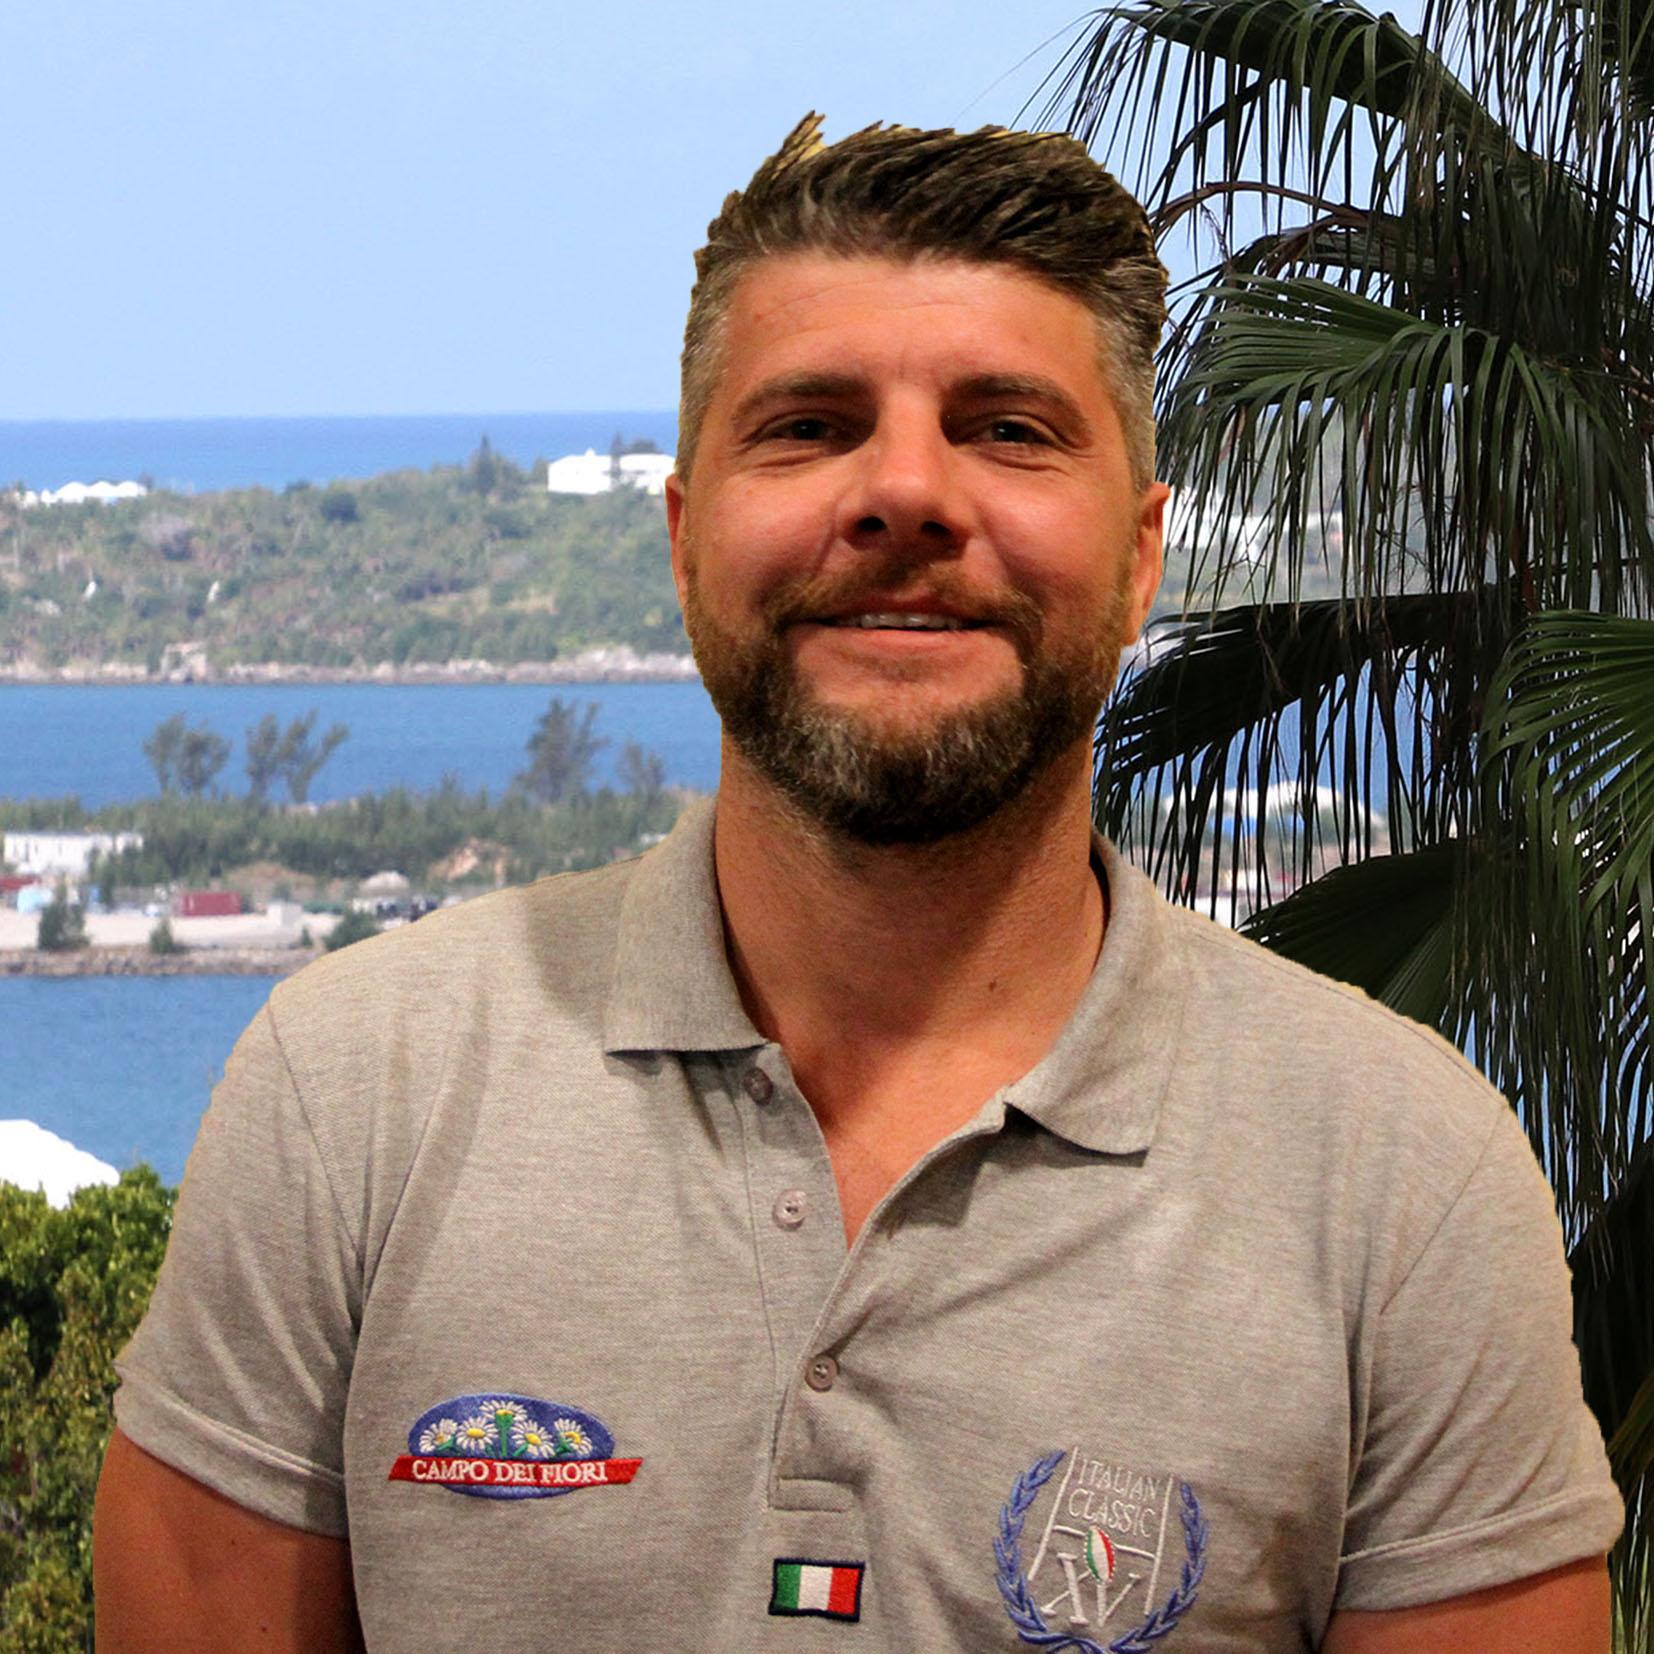 https://www.rugbyitalianclassicxv.com/wp-content/uploads/2019/04/WorldClassic2018_Bermuda_20181104_00_Cavalleri_ph_Turchetto.jpg